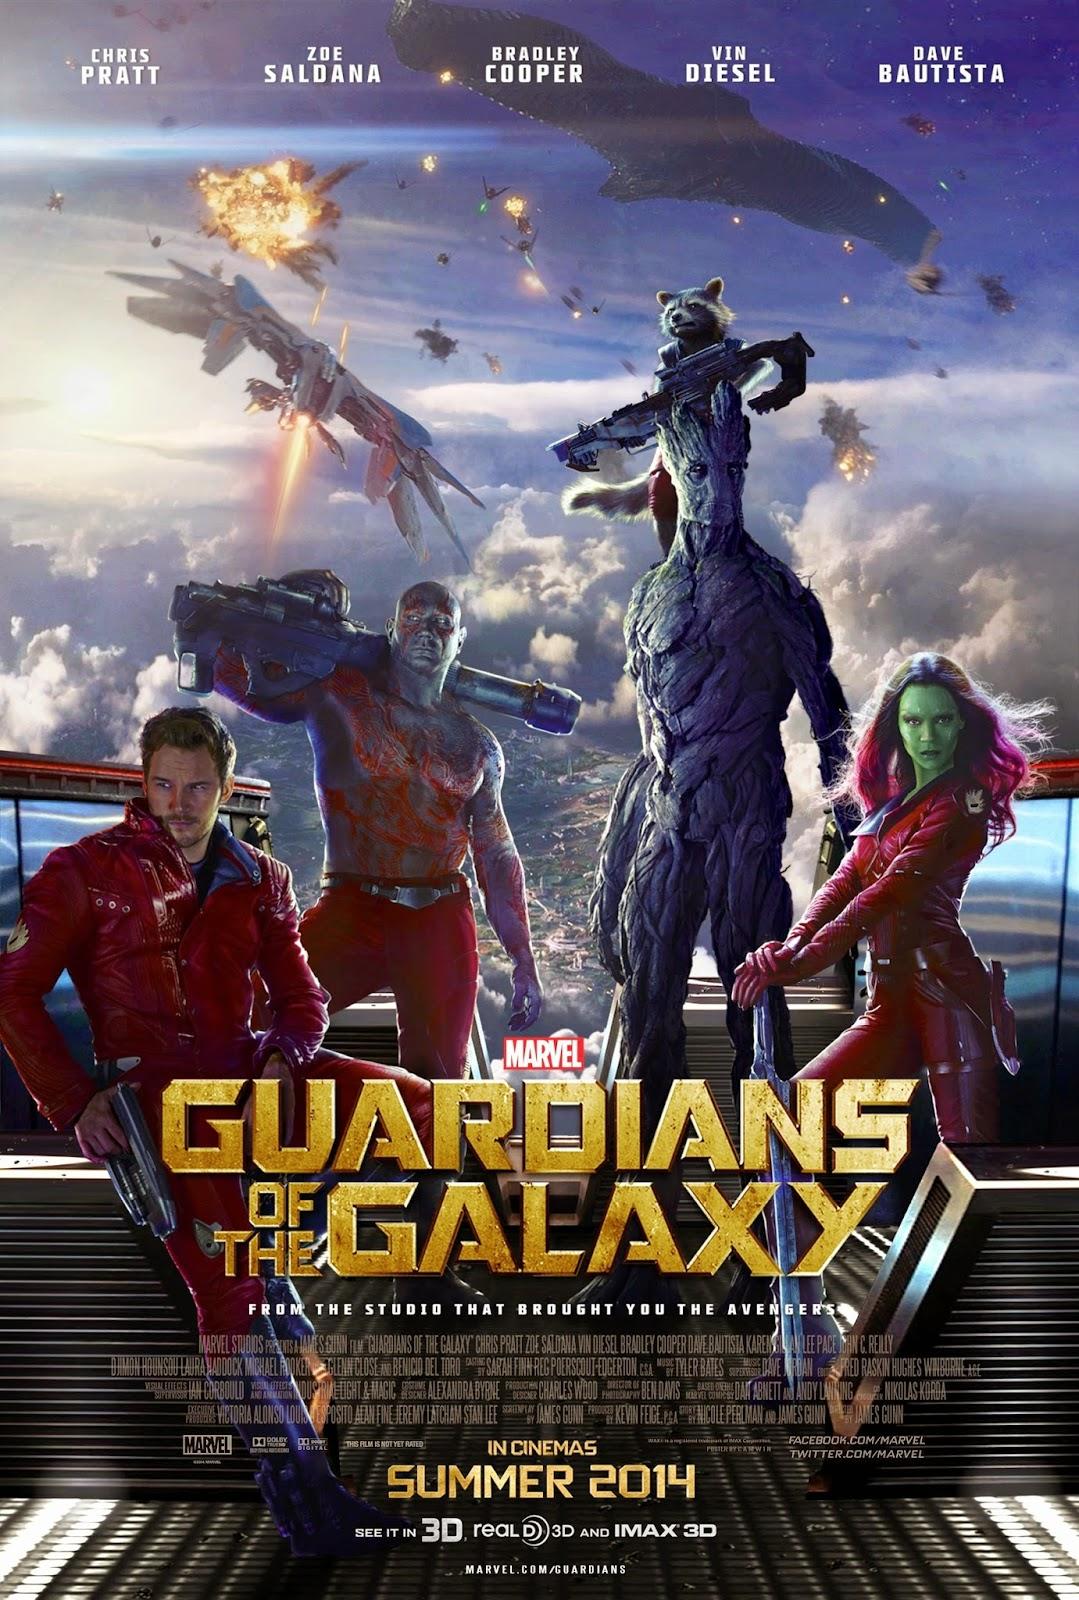 Poster หนัง Guardians of the Galaxy - รวมพันธุ์นักสู้พิทักษ์จักรวาล